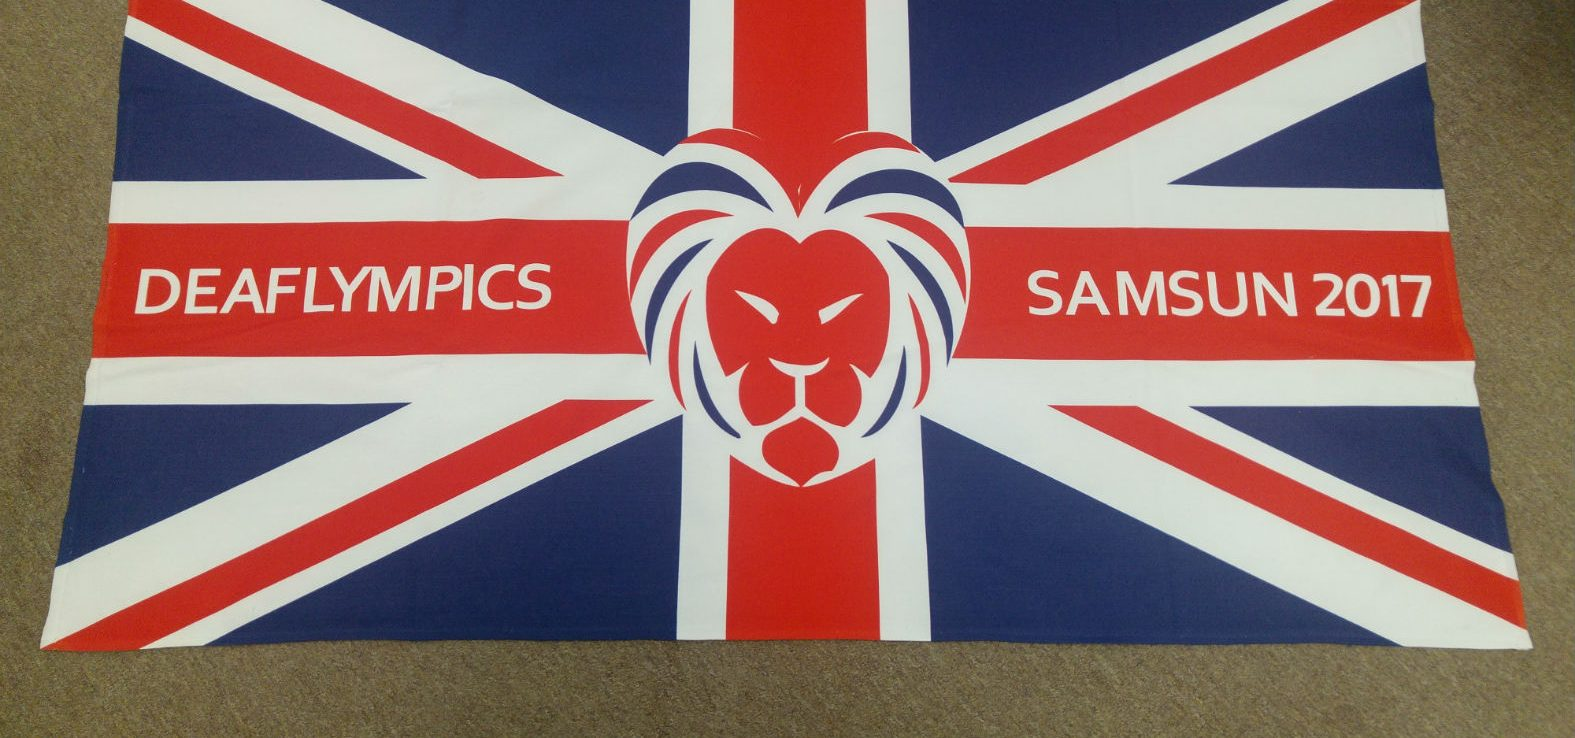 2017 DeaflympicsGB Samsun towel